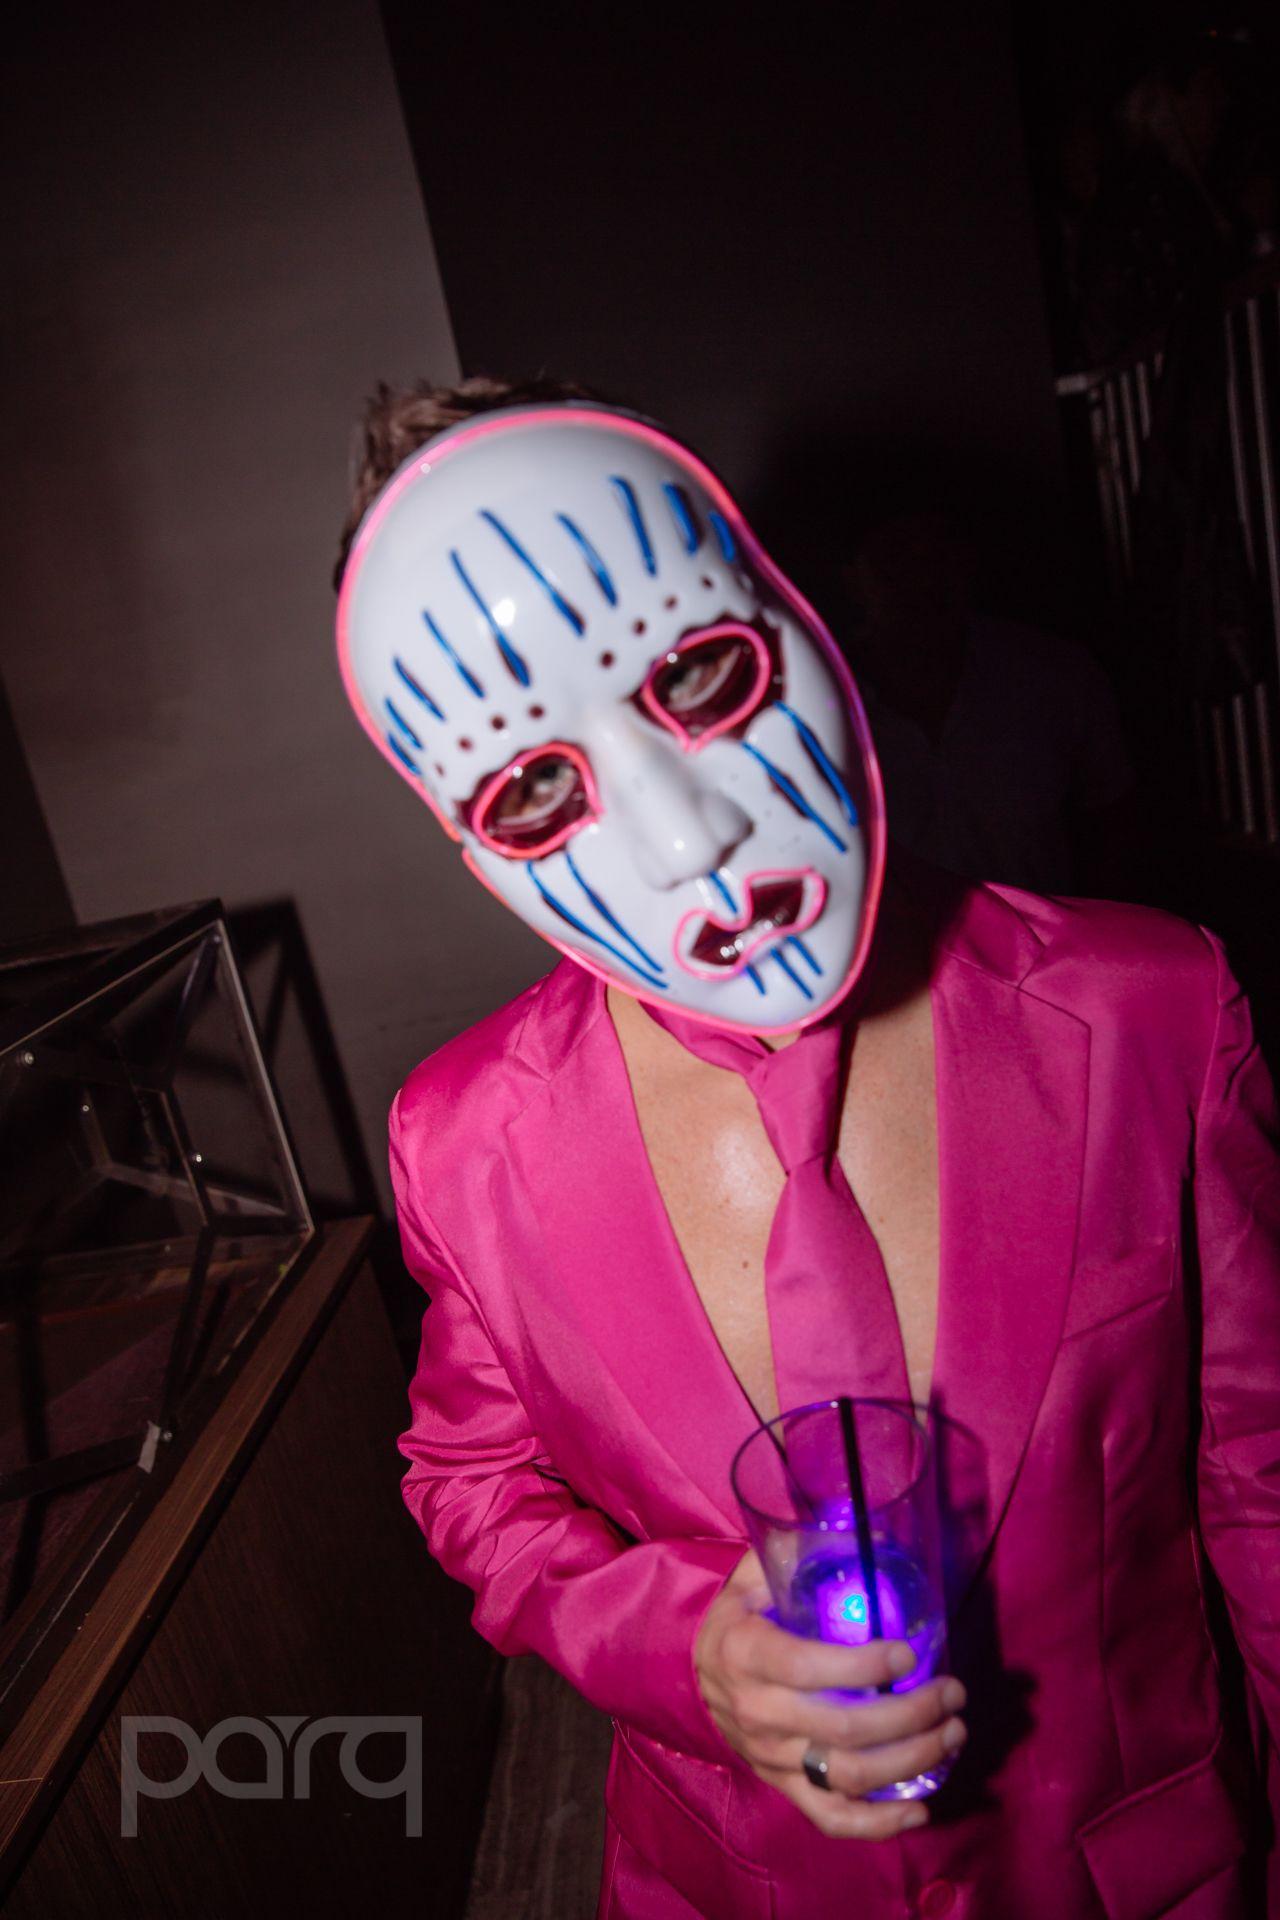 10.28.17 Parq - Haunted Circus-20.jpg